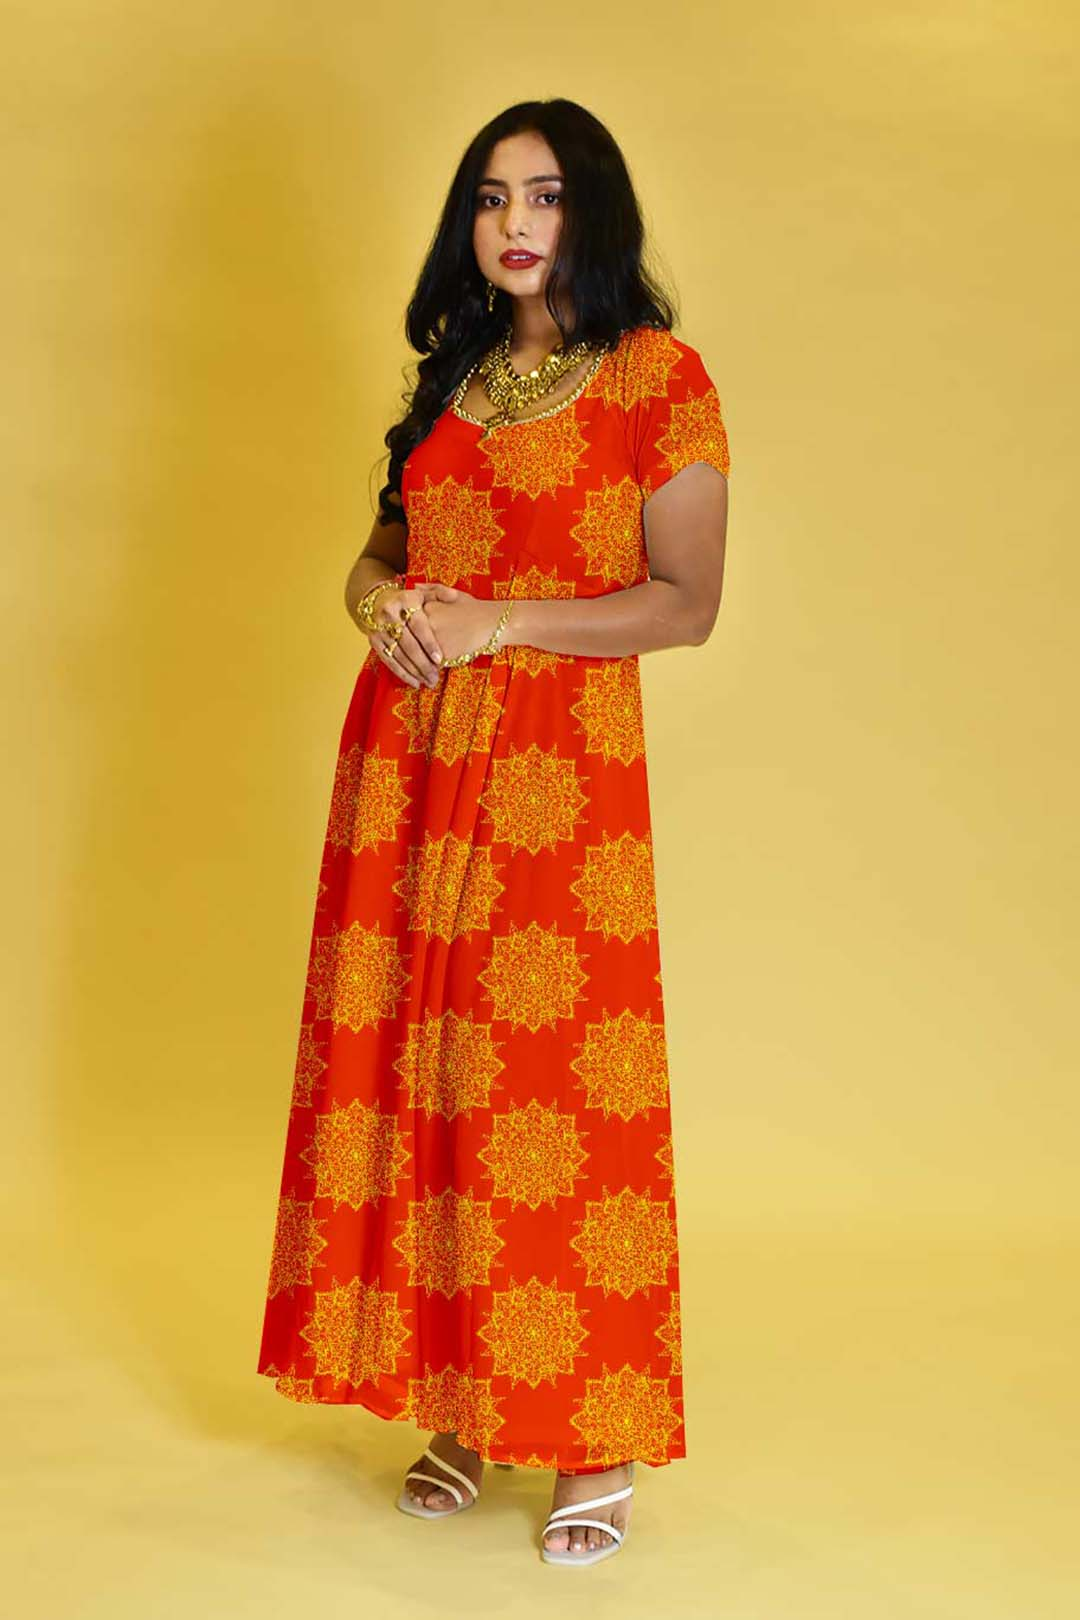 Satin Anarkali dress – The Stunner